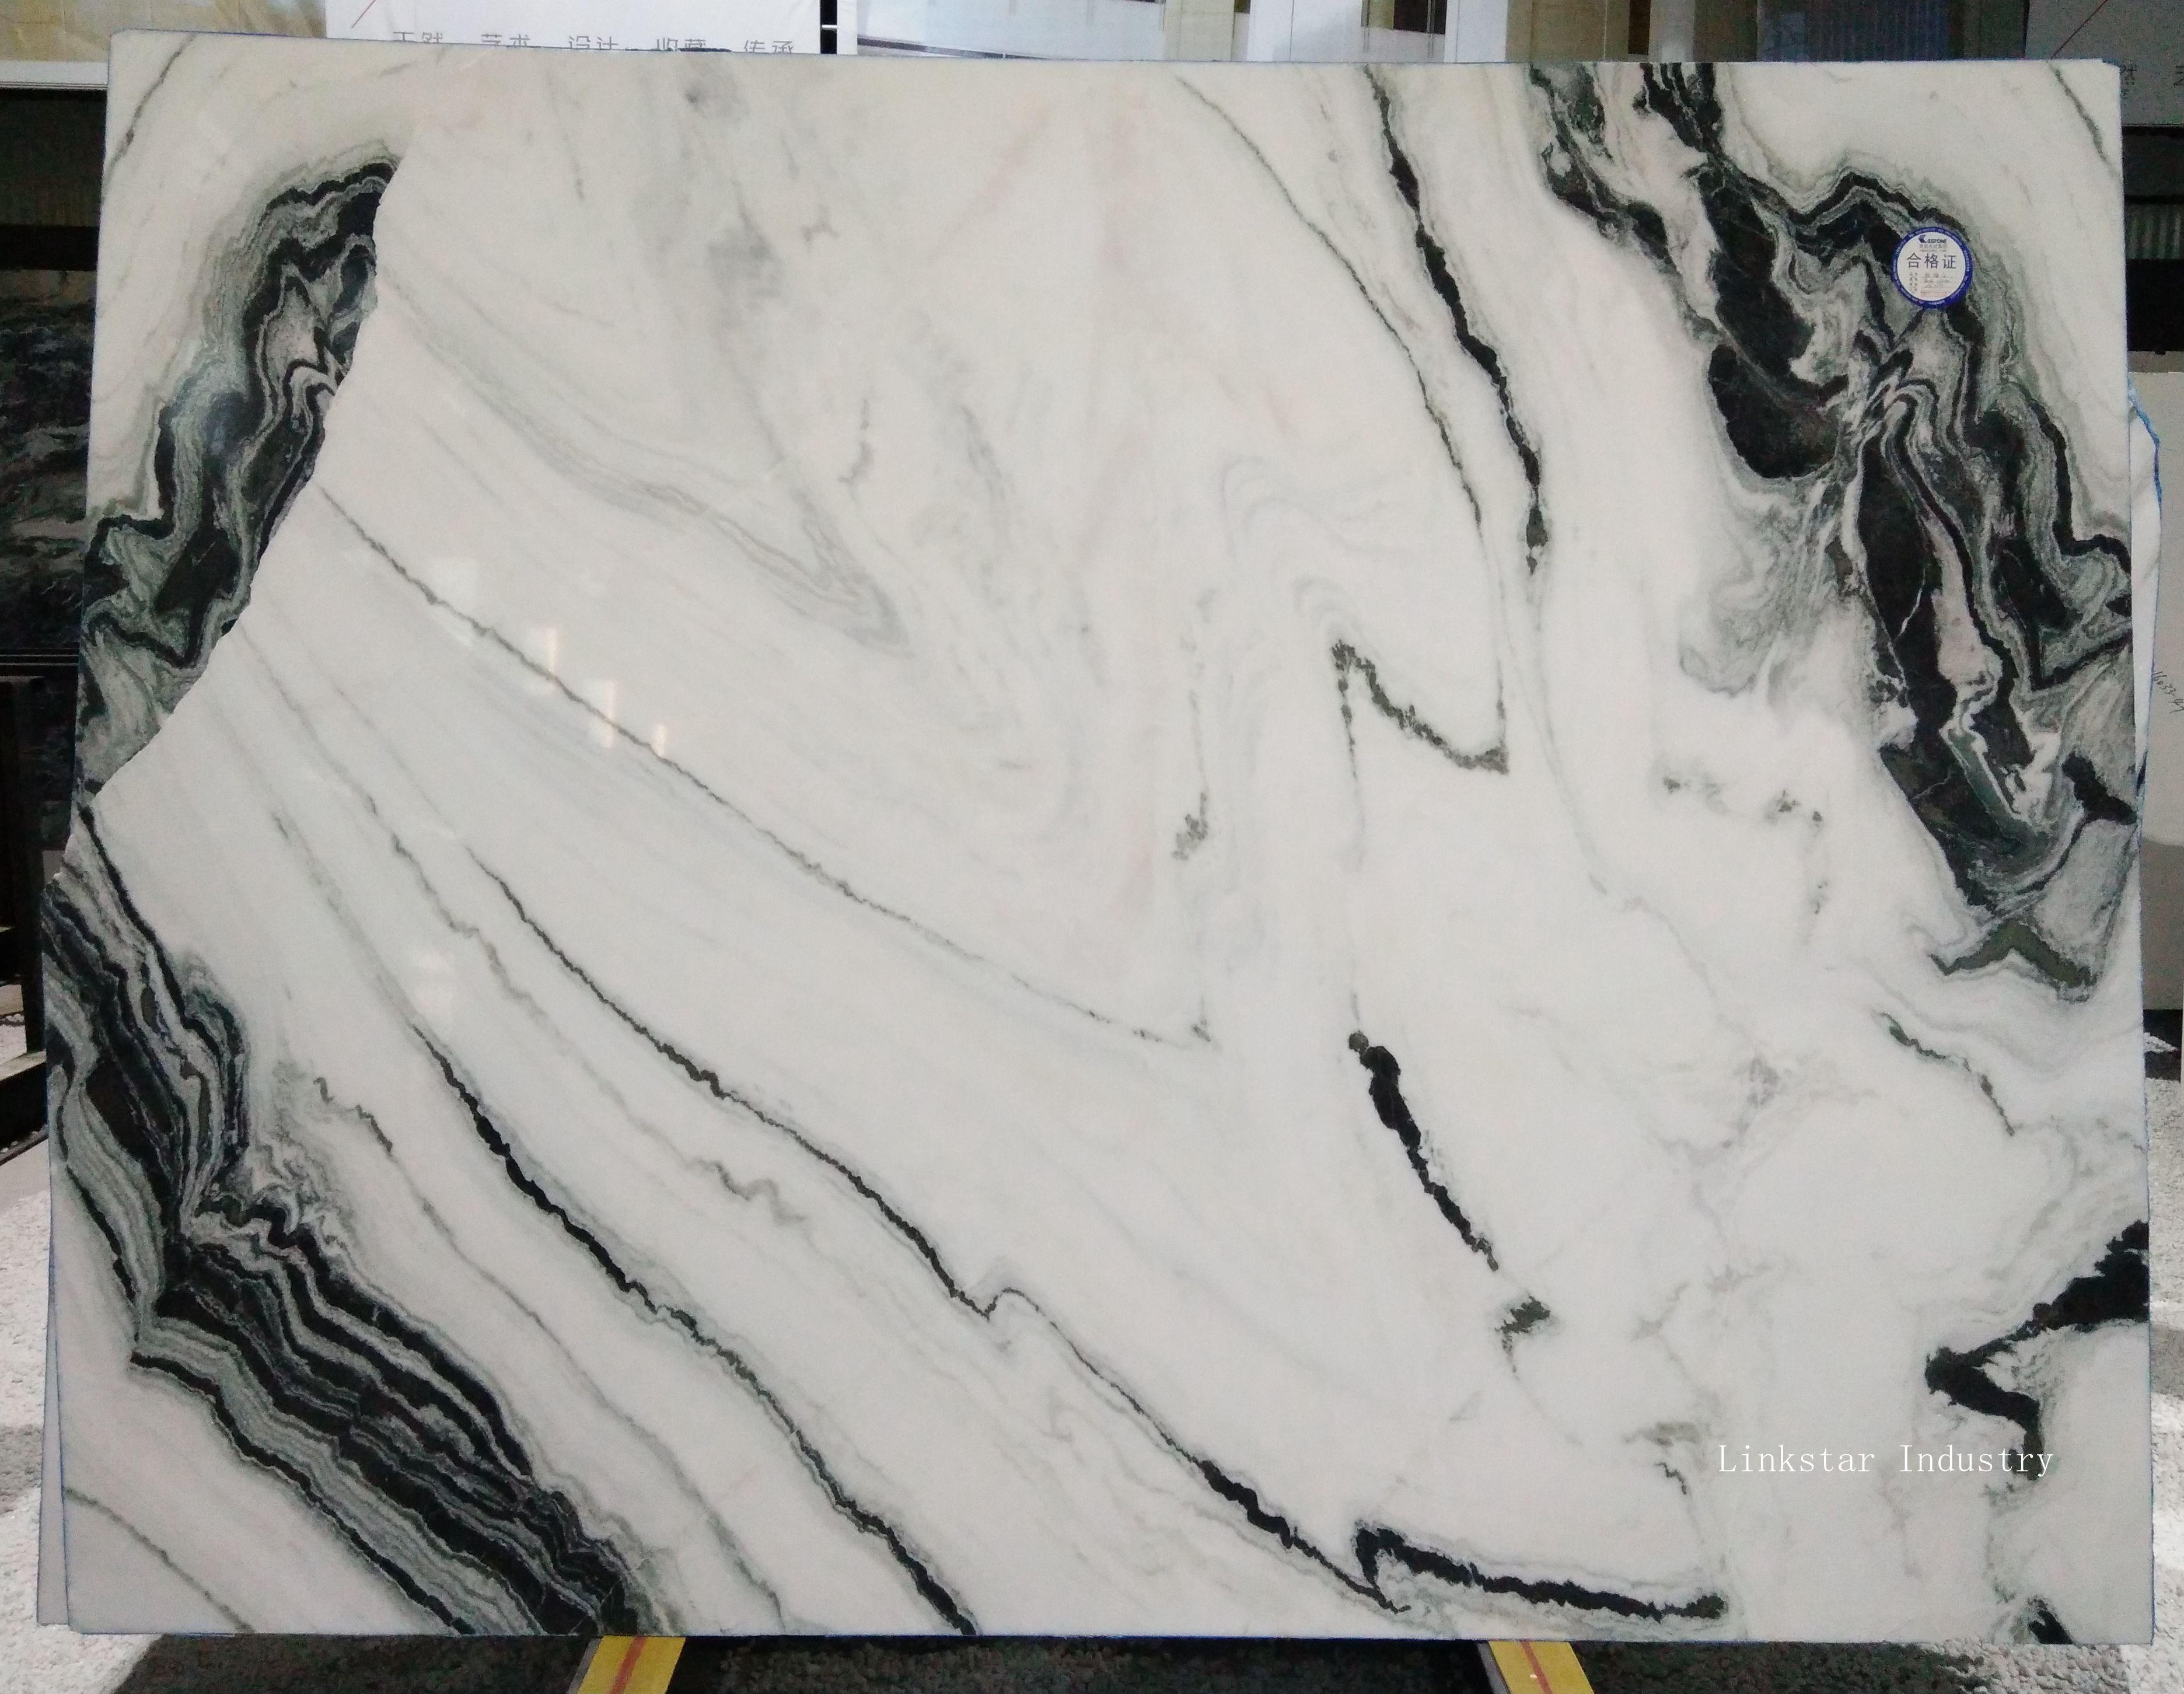 Panda White Stone Slab Tile